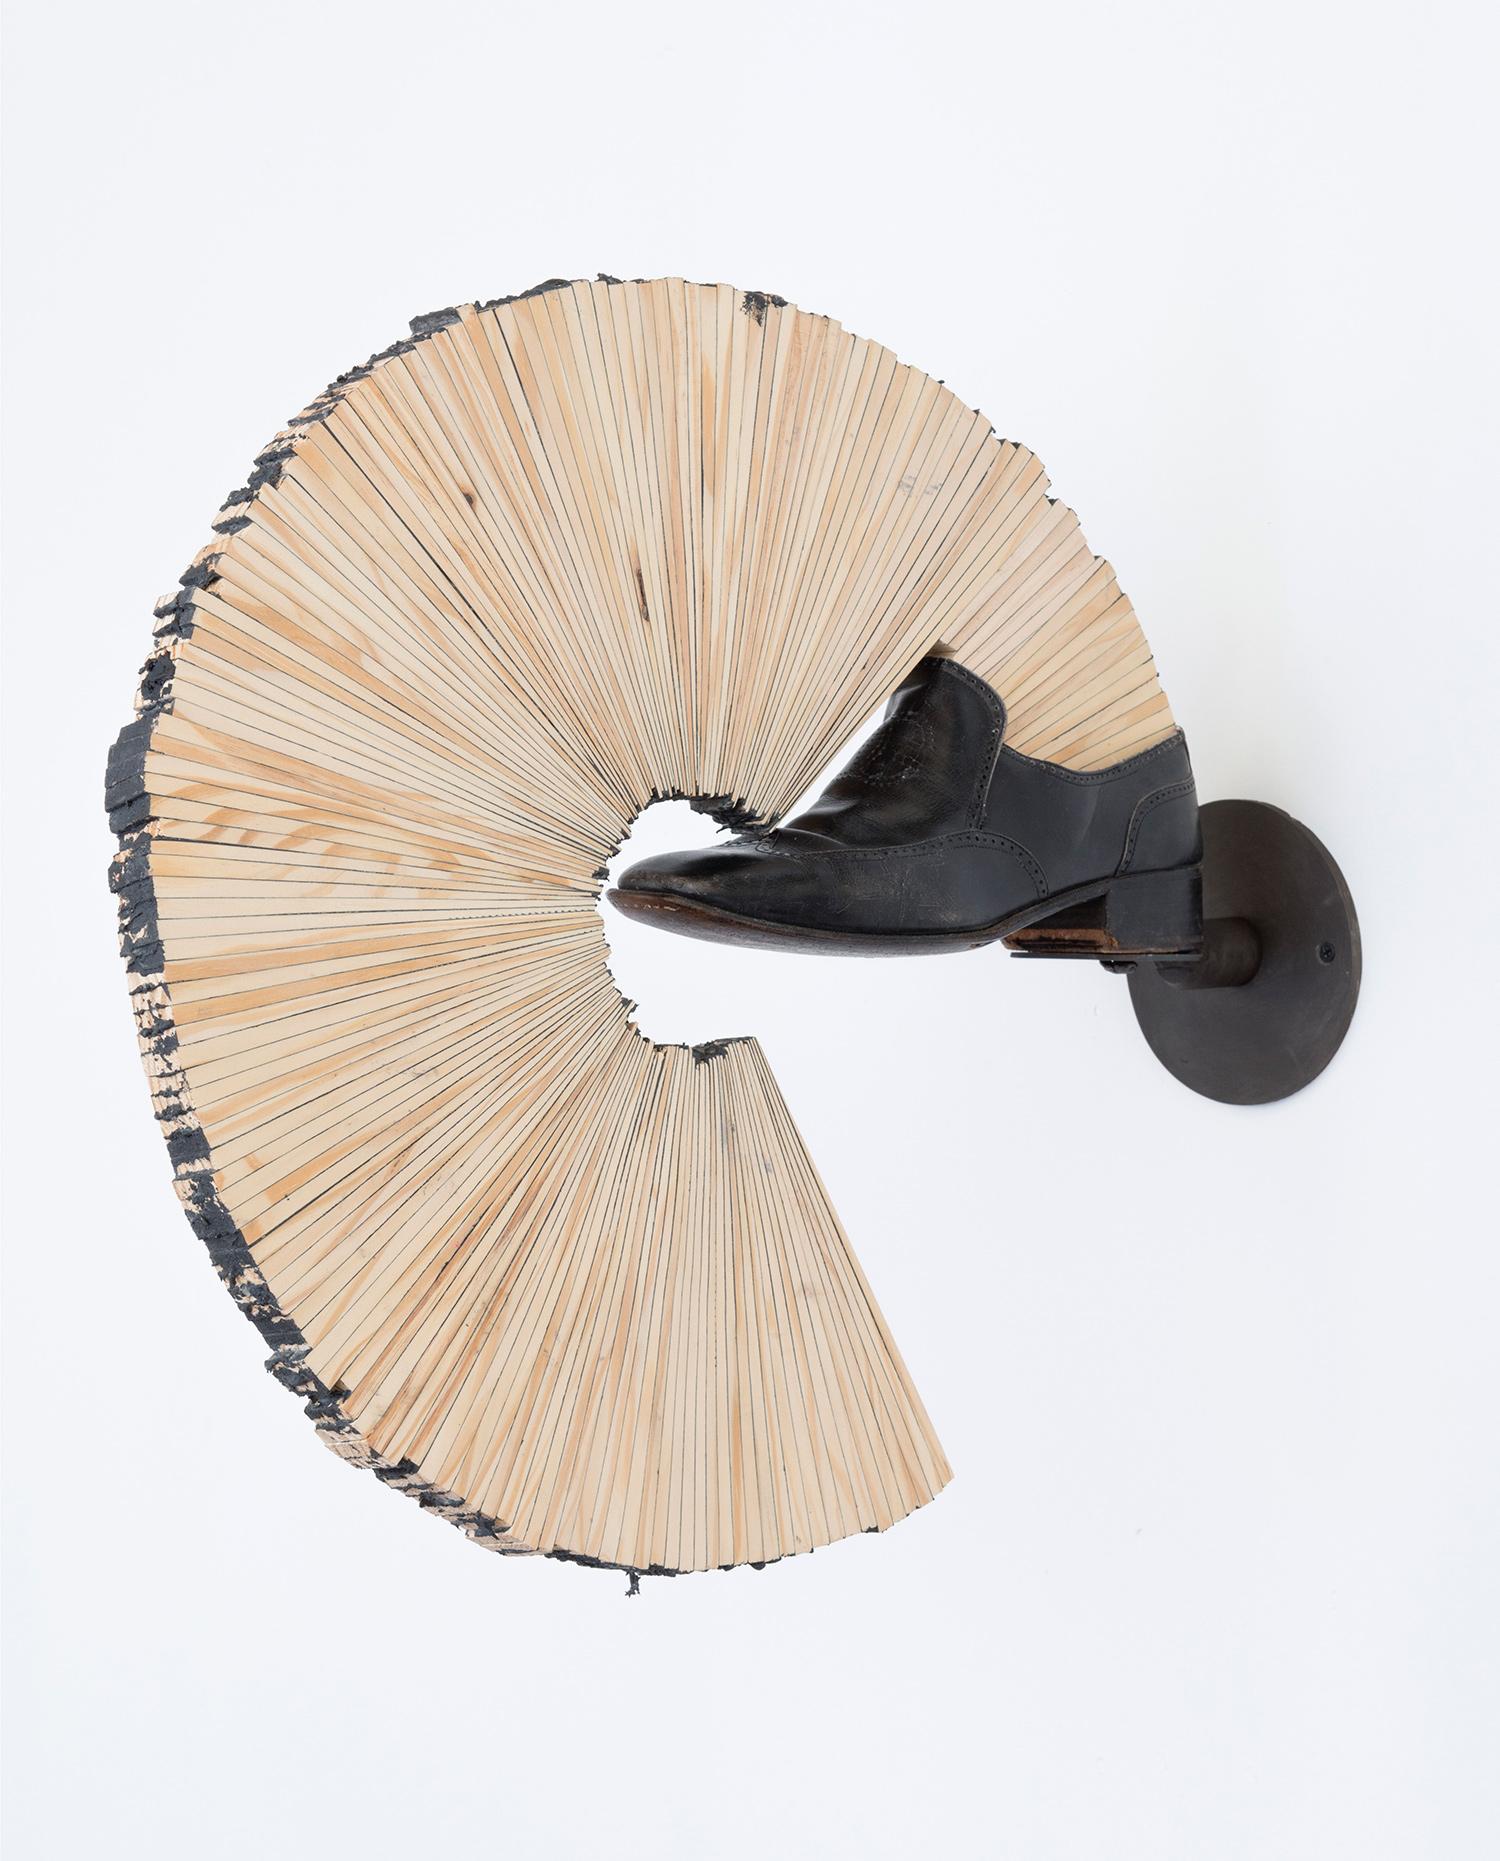 "Hedge_Left . Pine, leather, mild steel, caulk, chewing gum. 23"" x 19.5"" x 5"". 2014."